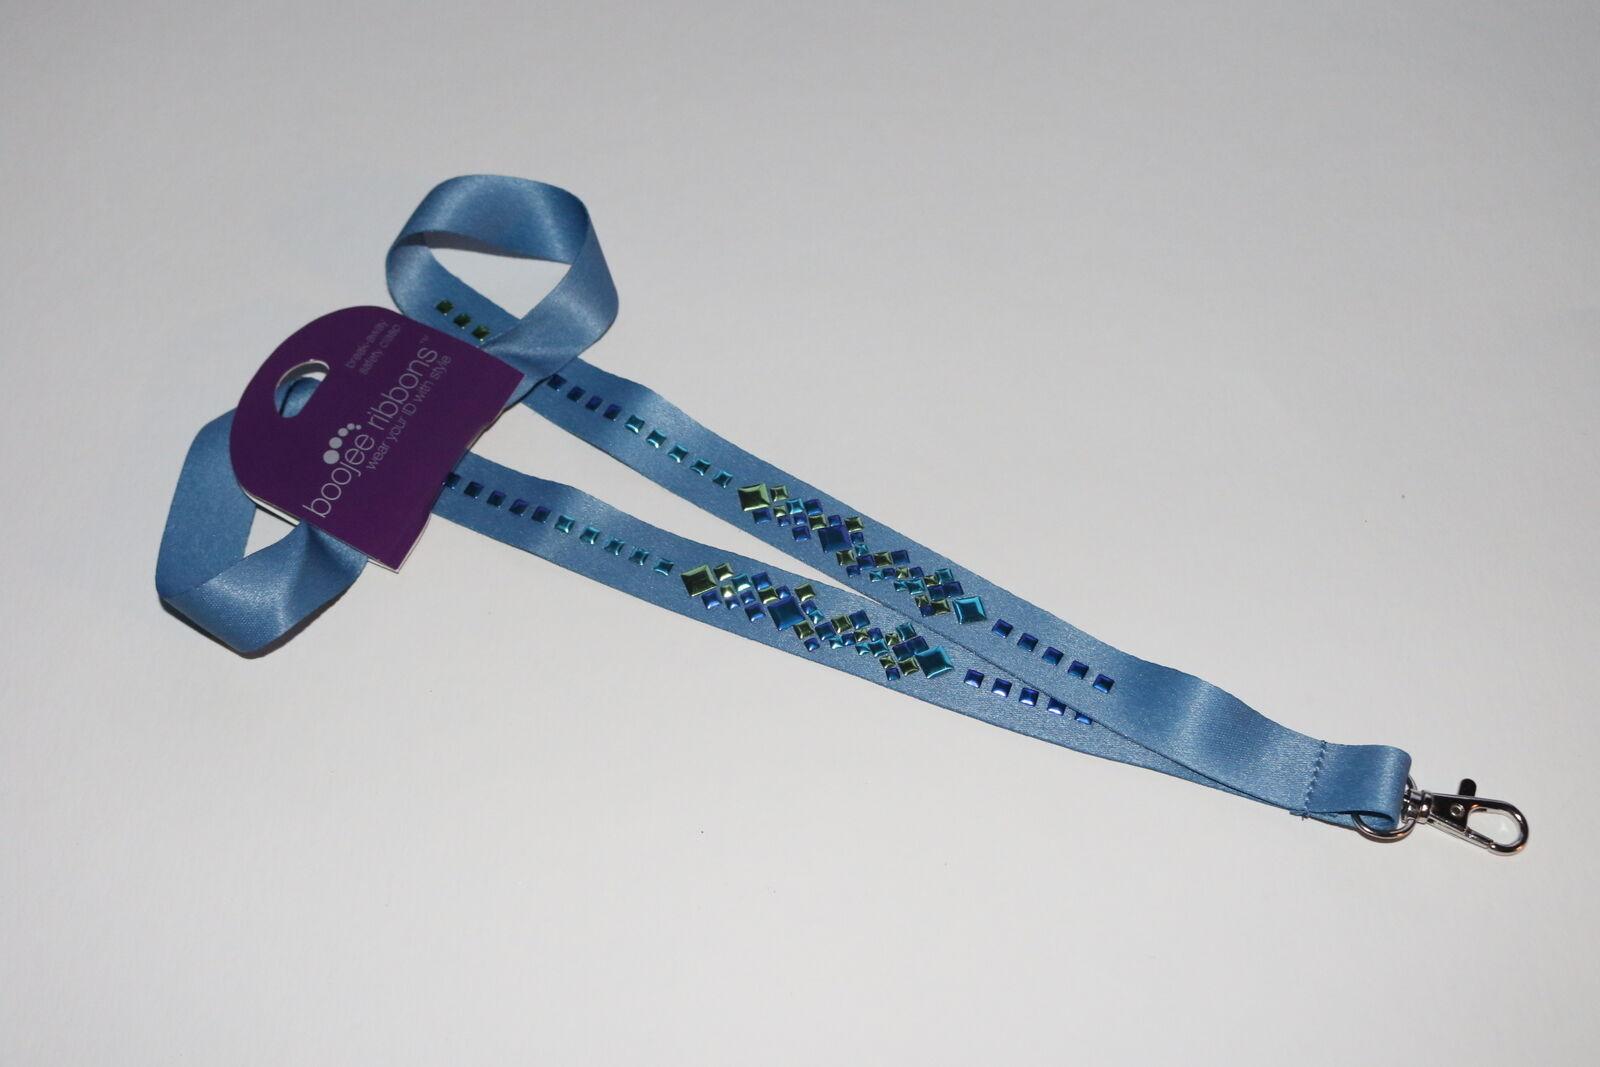 BooJee Ribbons Femmes Mode Cordon Id Badge Support - Bleu Glacier 100391